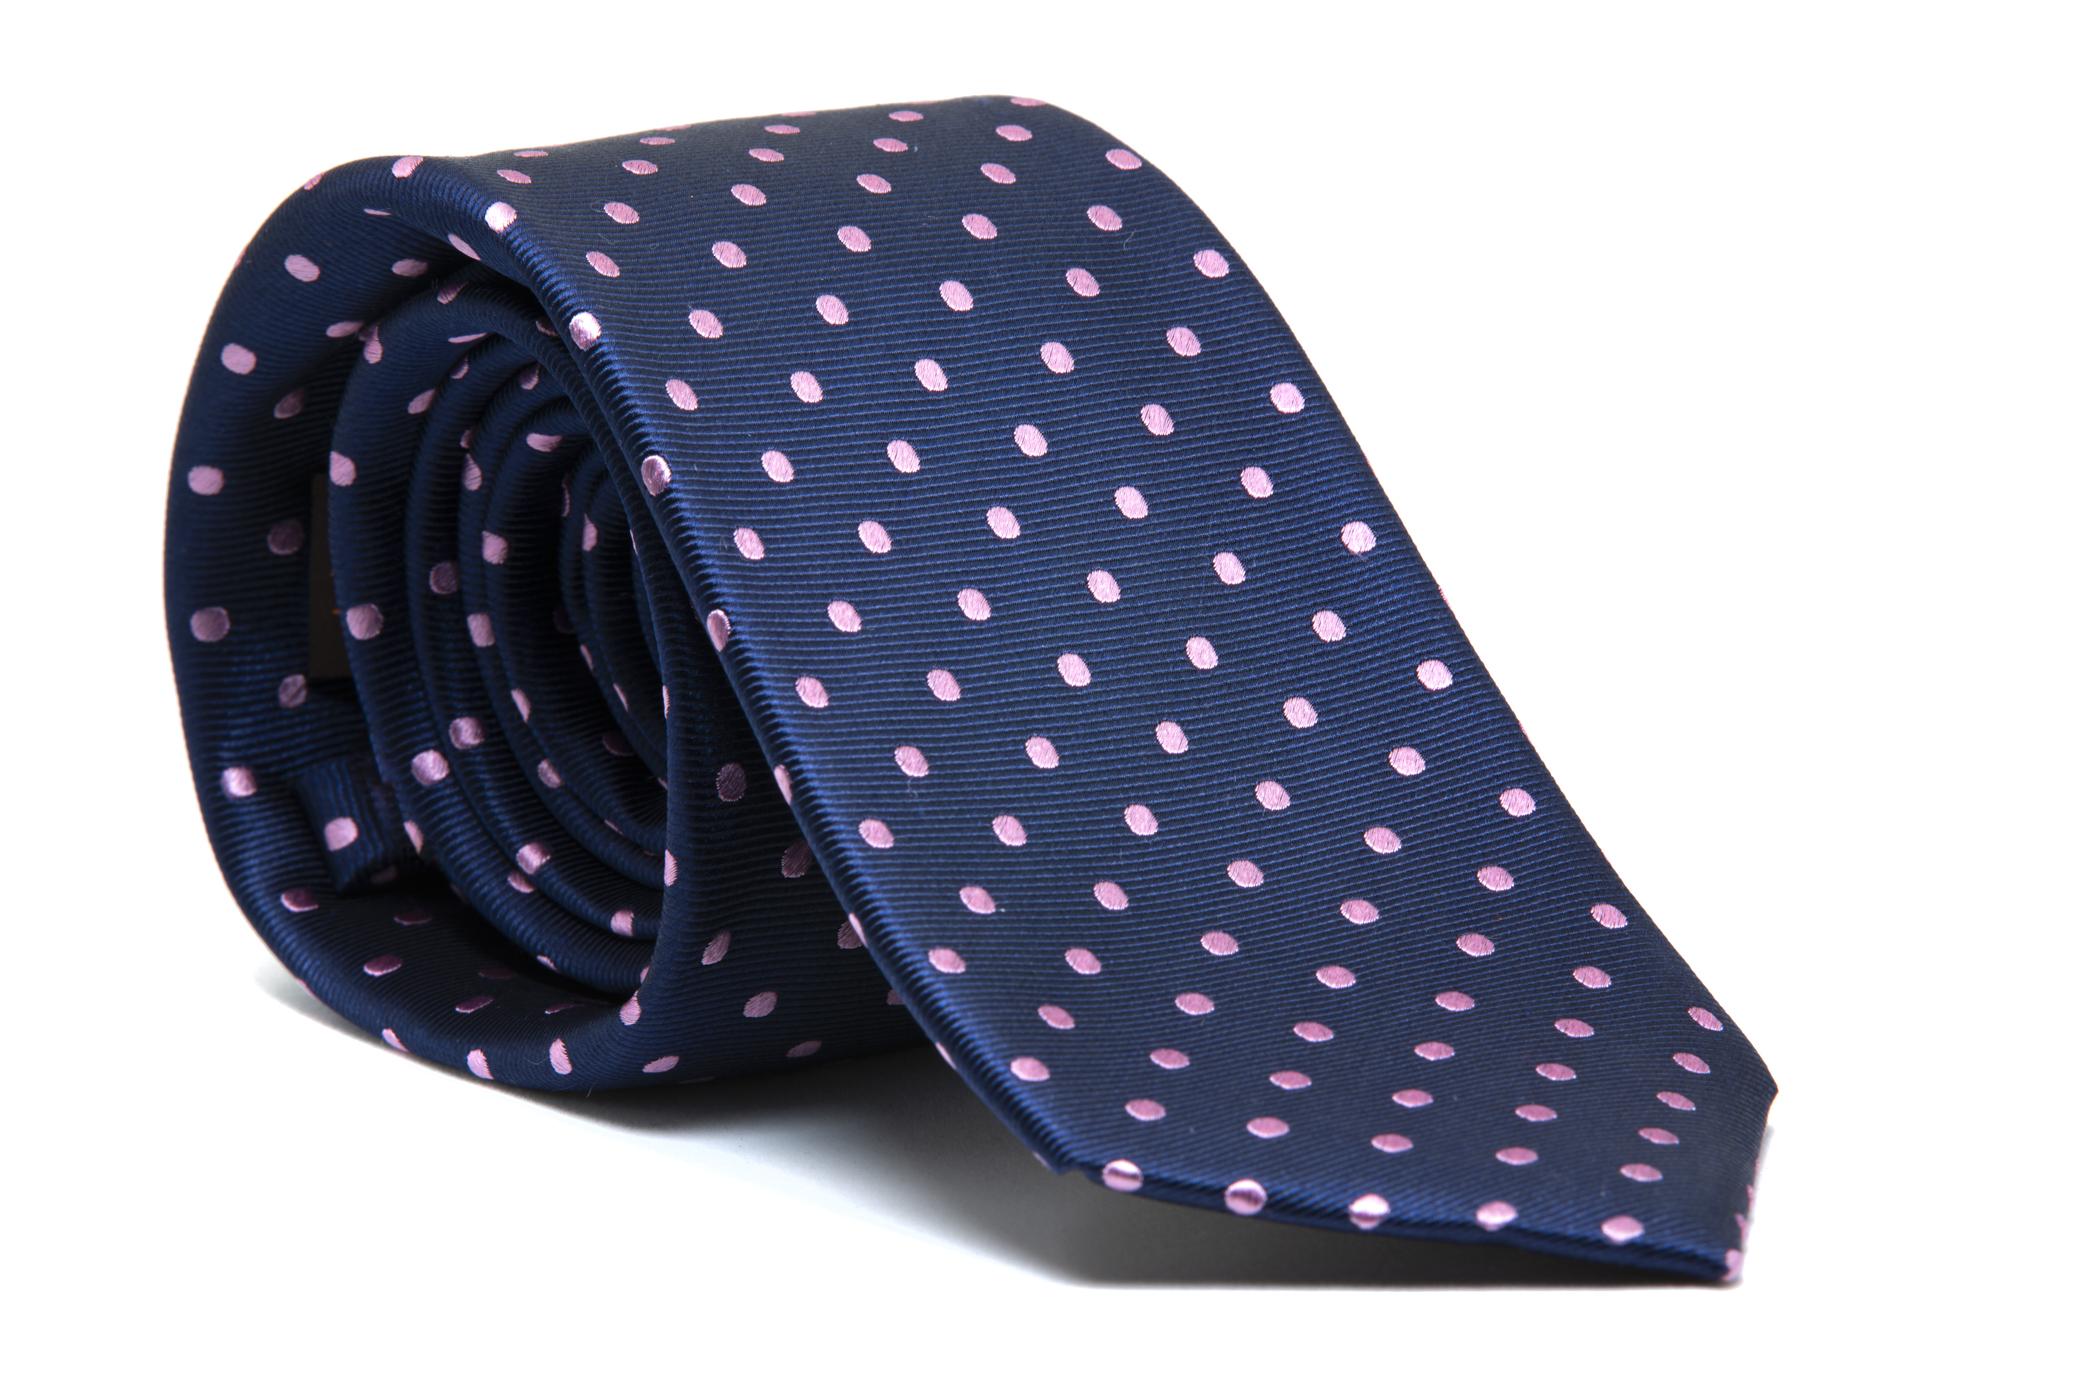 ofertas exclusivas buscar autorización ajuste clásico Corbata azul marino con topos rosa palo